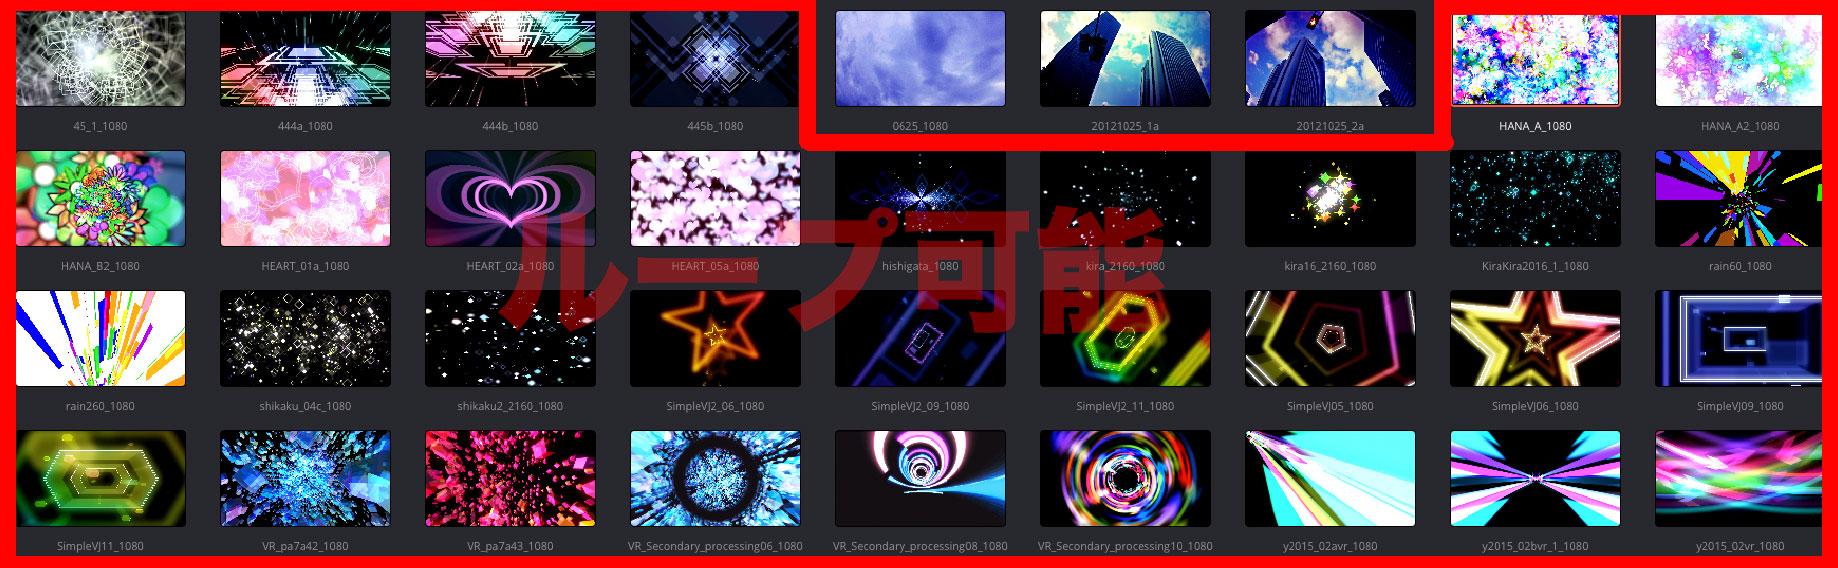 MovieMaterial HDVJ6 フルハイビジョンVJ動画素材集 画像11